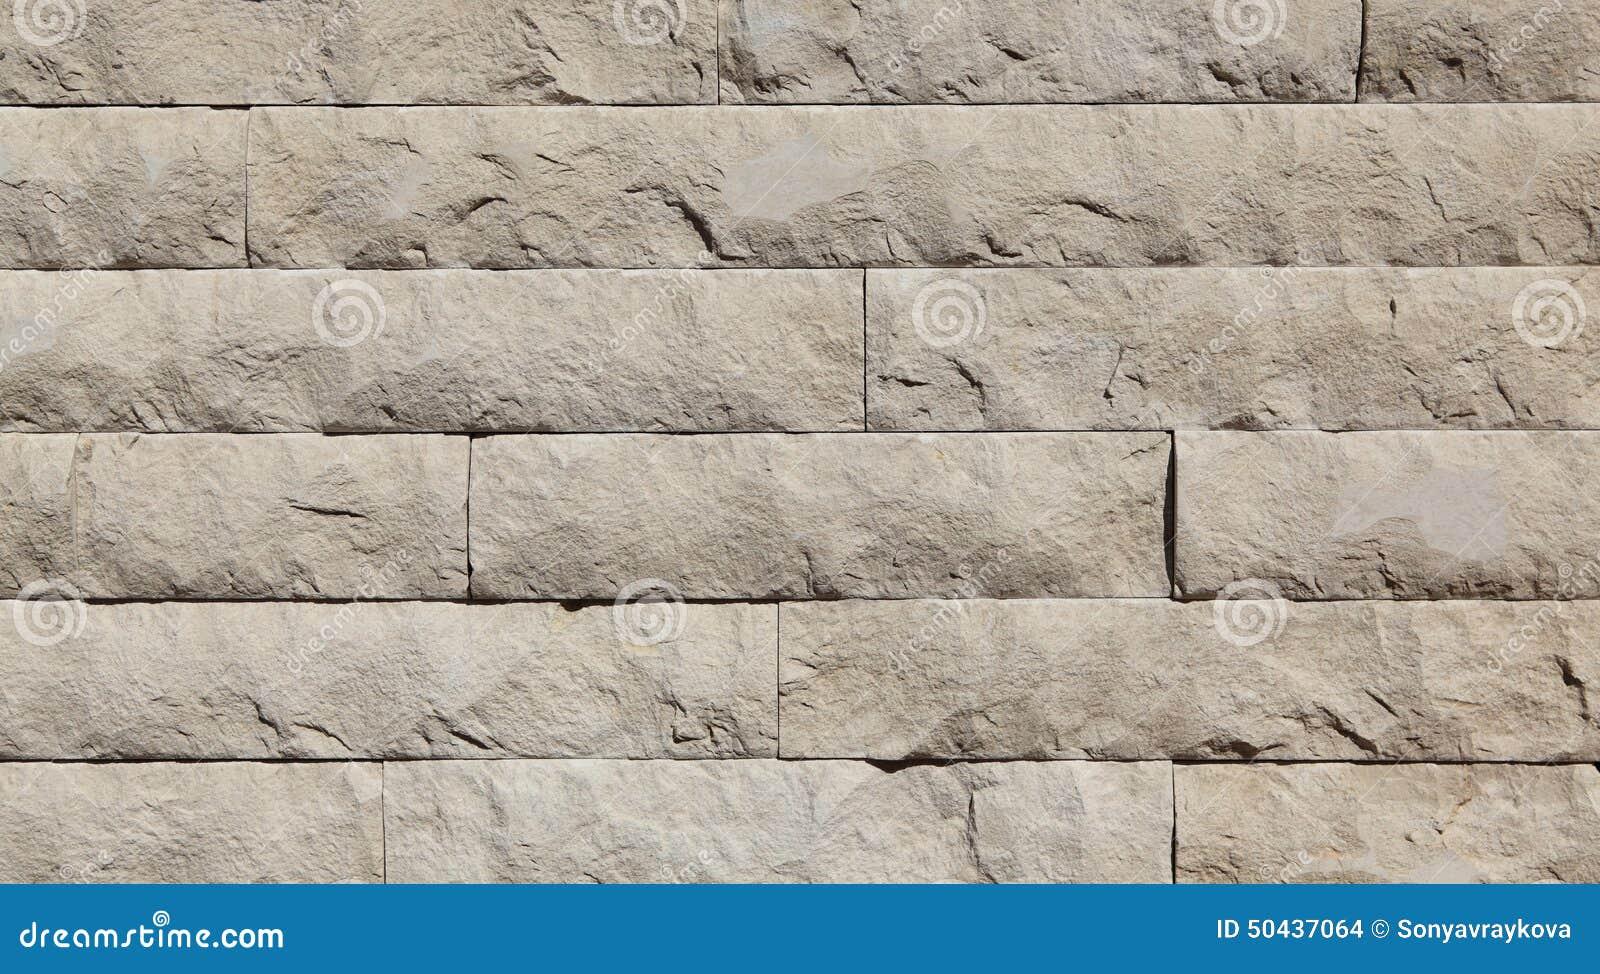 Travertine Stone Wall Stock Photo Image Of Houses Decoration 50437064